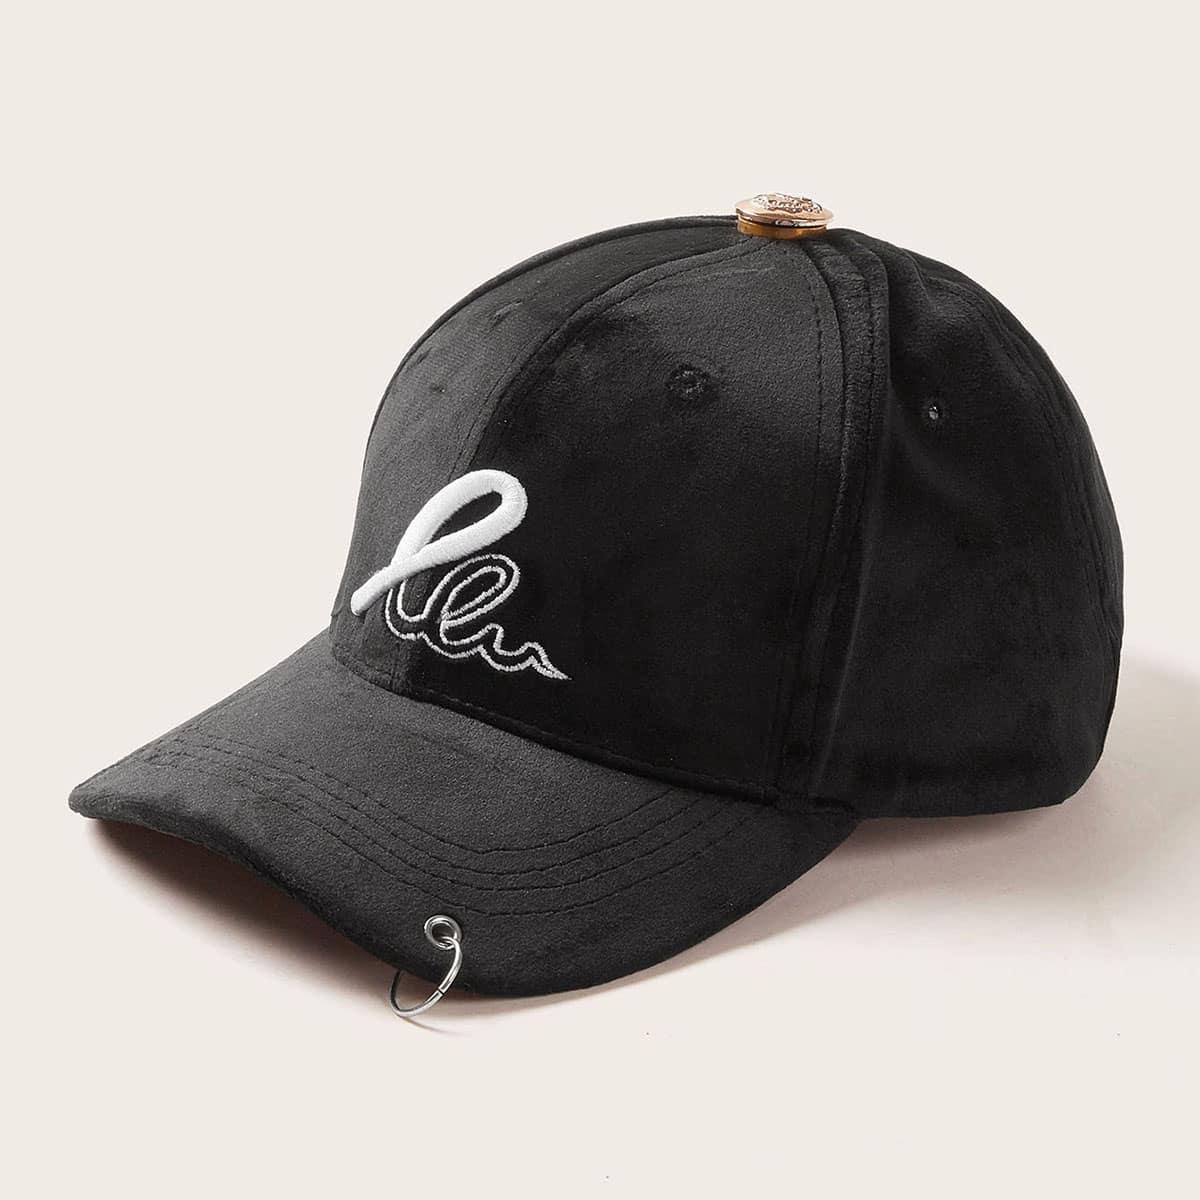 Heren Hoop Decor Baseball Cap